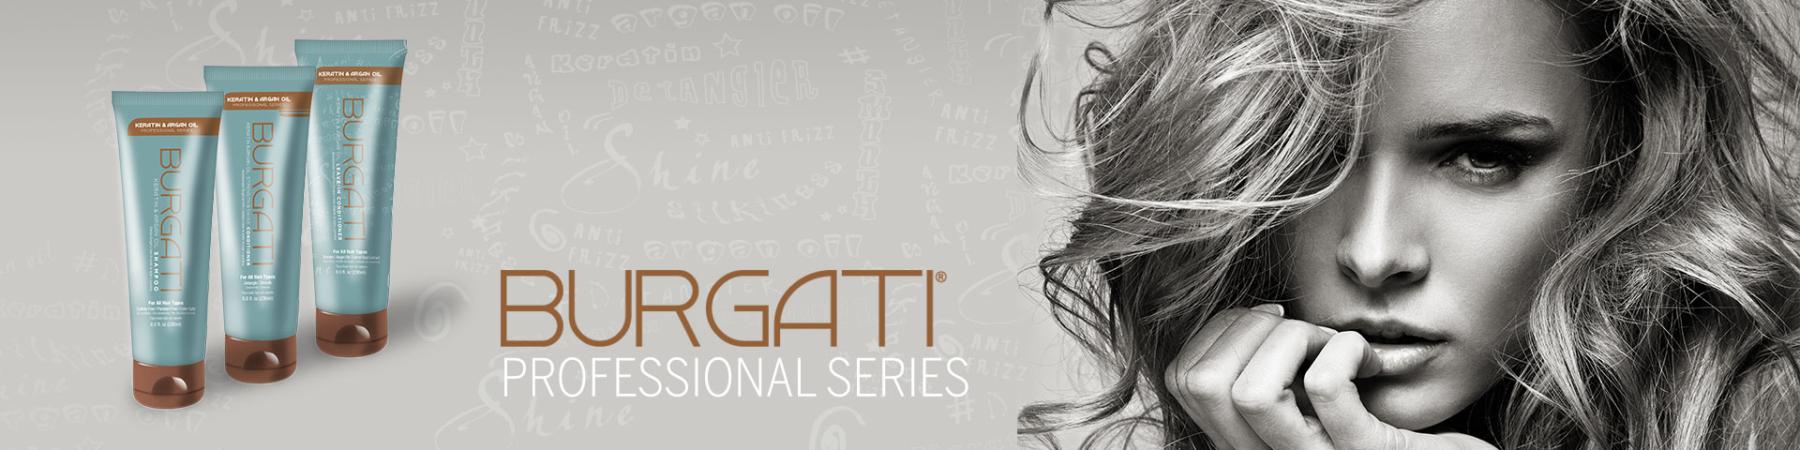 Burgati Keratin & Argan Oil Professional Series